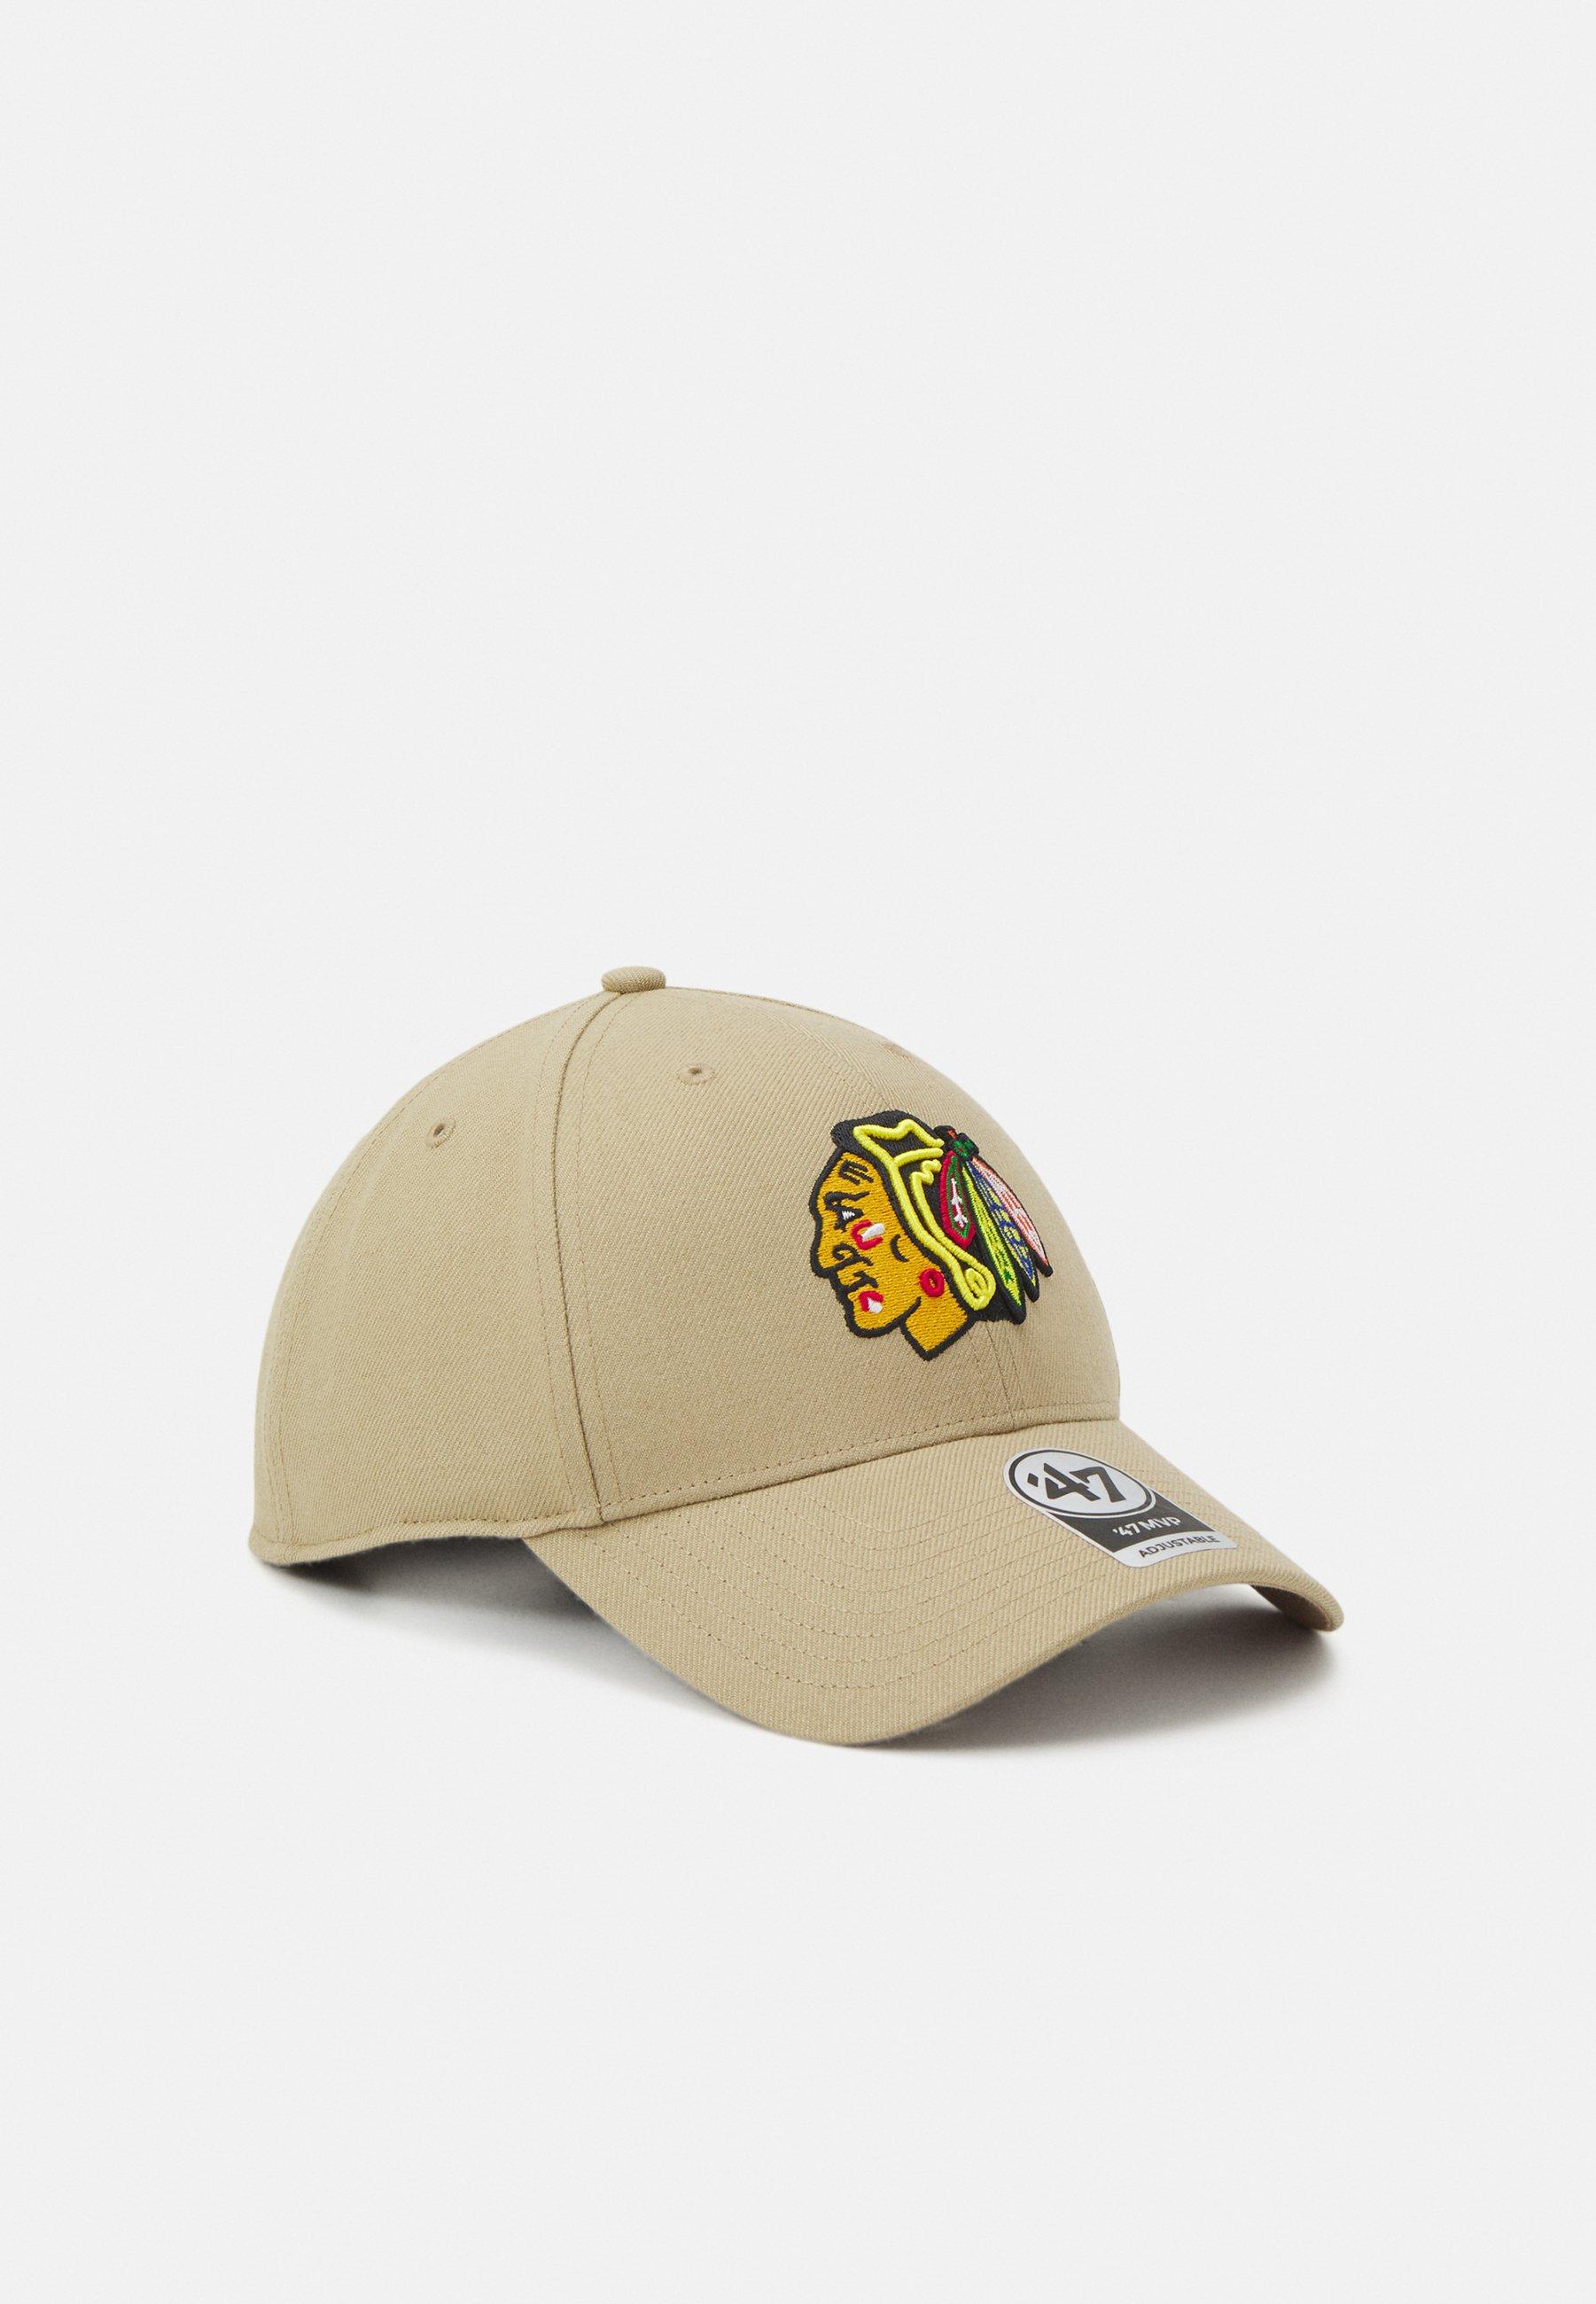 Hombre NHL CHICAGO BLACKHAWKS SNAPBACK UNISEX - Gorra